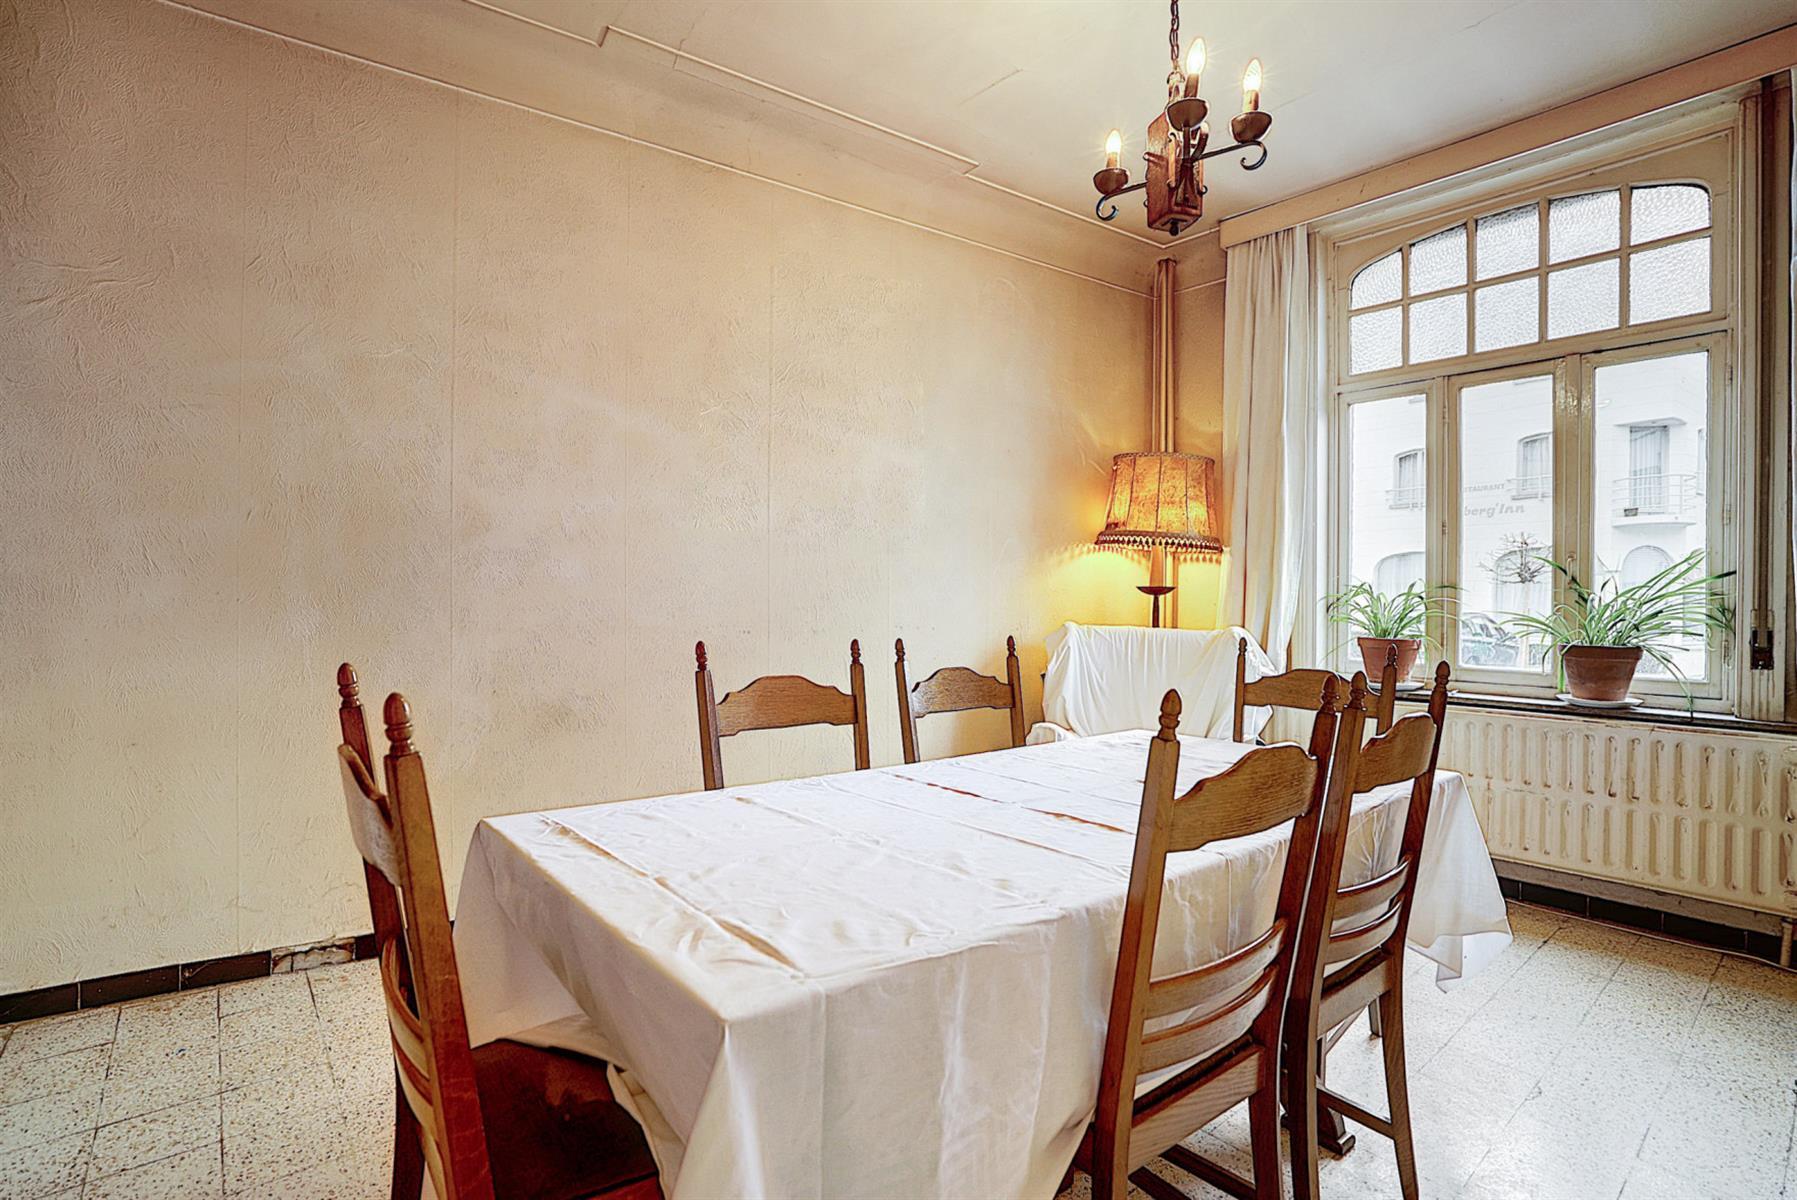 Maison - Ottignies-Louvain-la-Neuve - #4262981-7